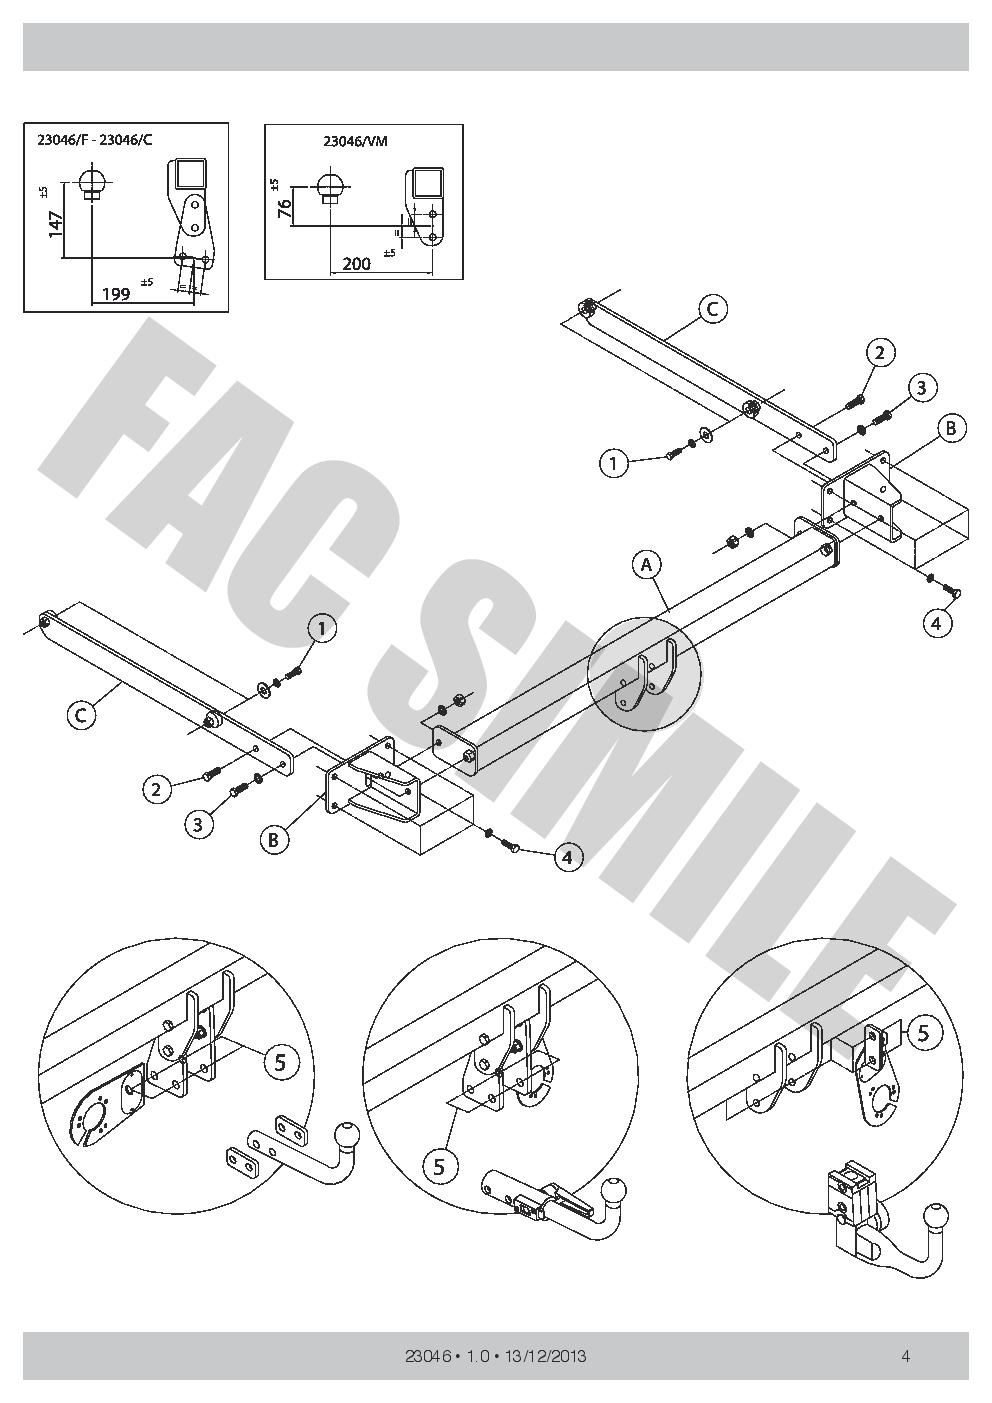 Vertical Towbar 13p C2 Wiring For Mercedes C Class Est Amg 07 14 Benz C240 Diagram